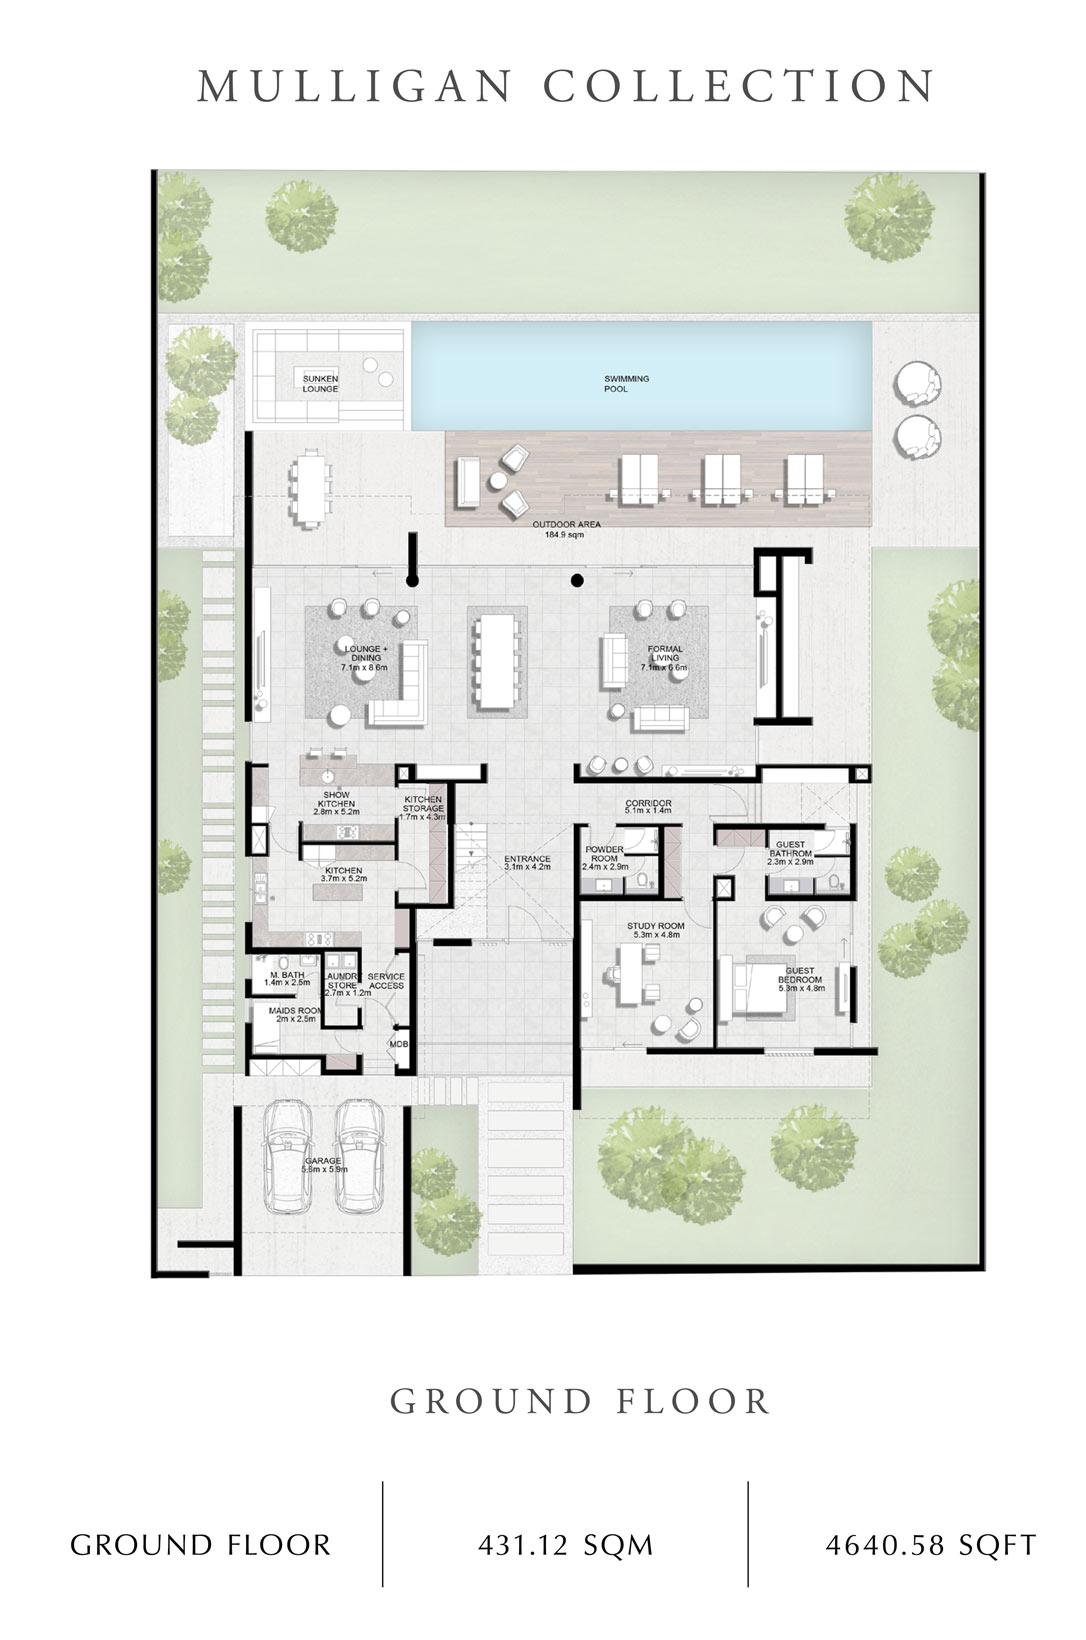 Mulligan-Collection-Ground Floor, Size 4640 Sq Ft